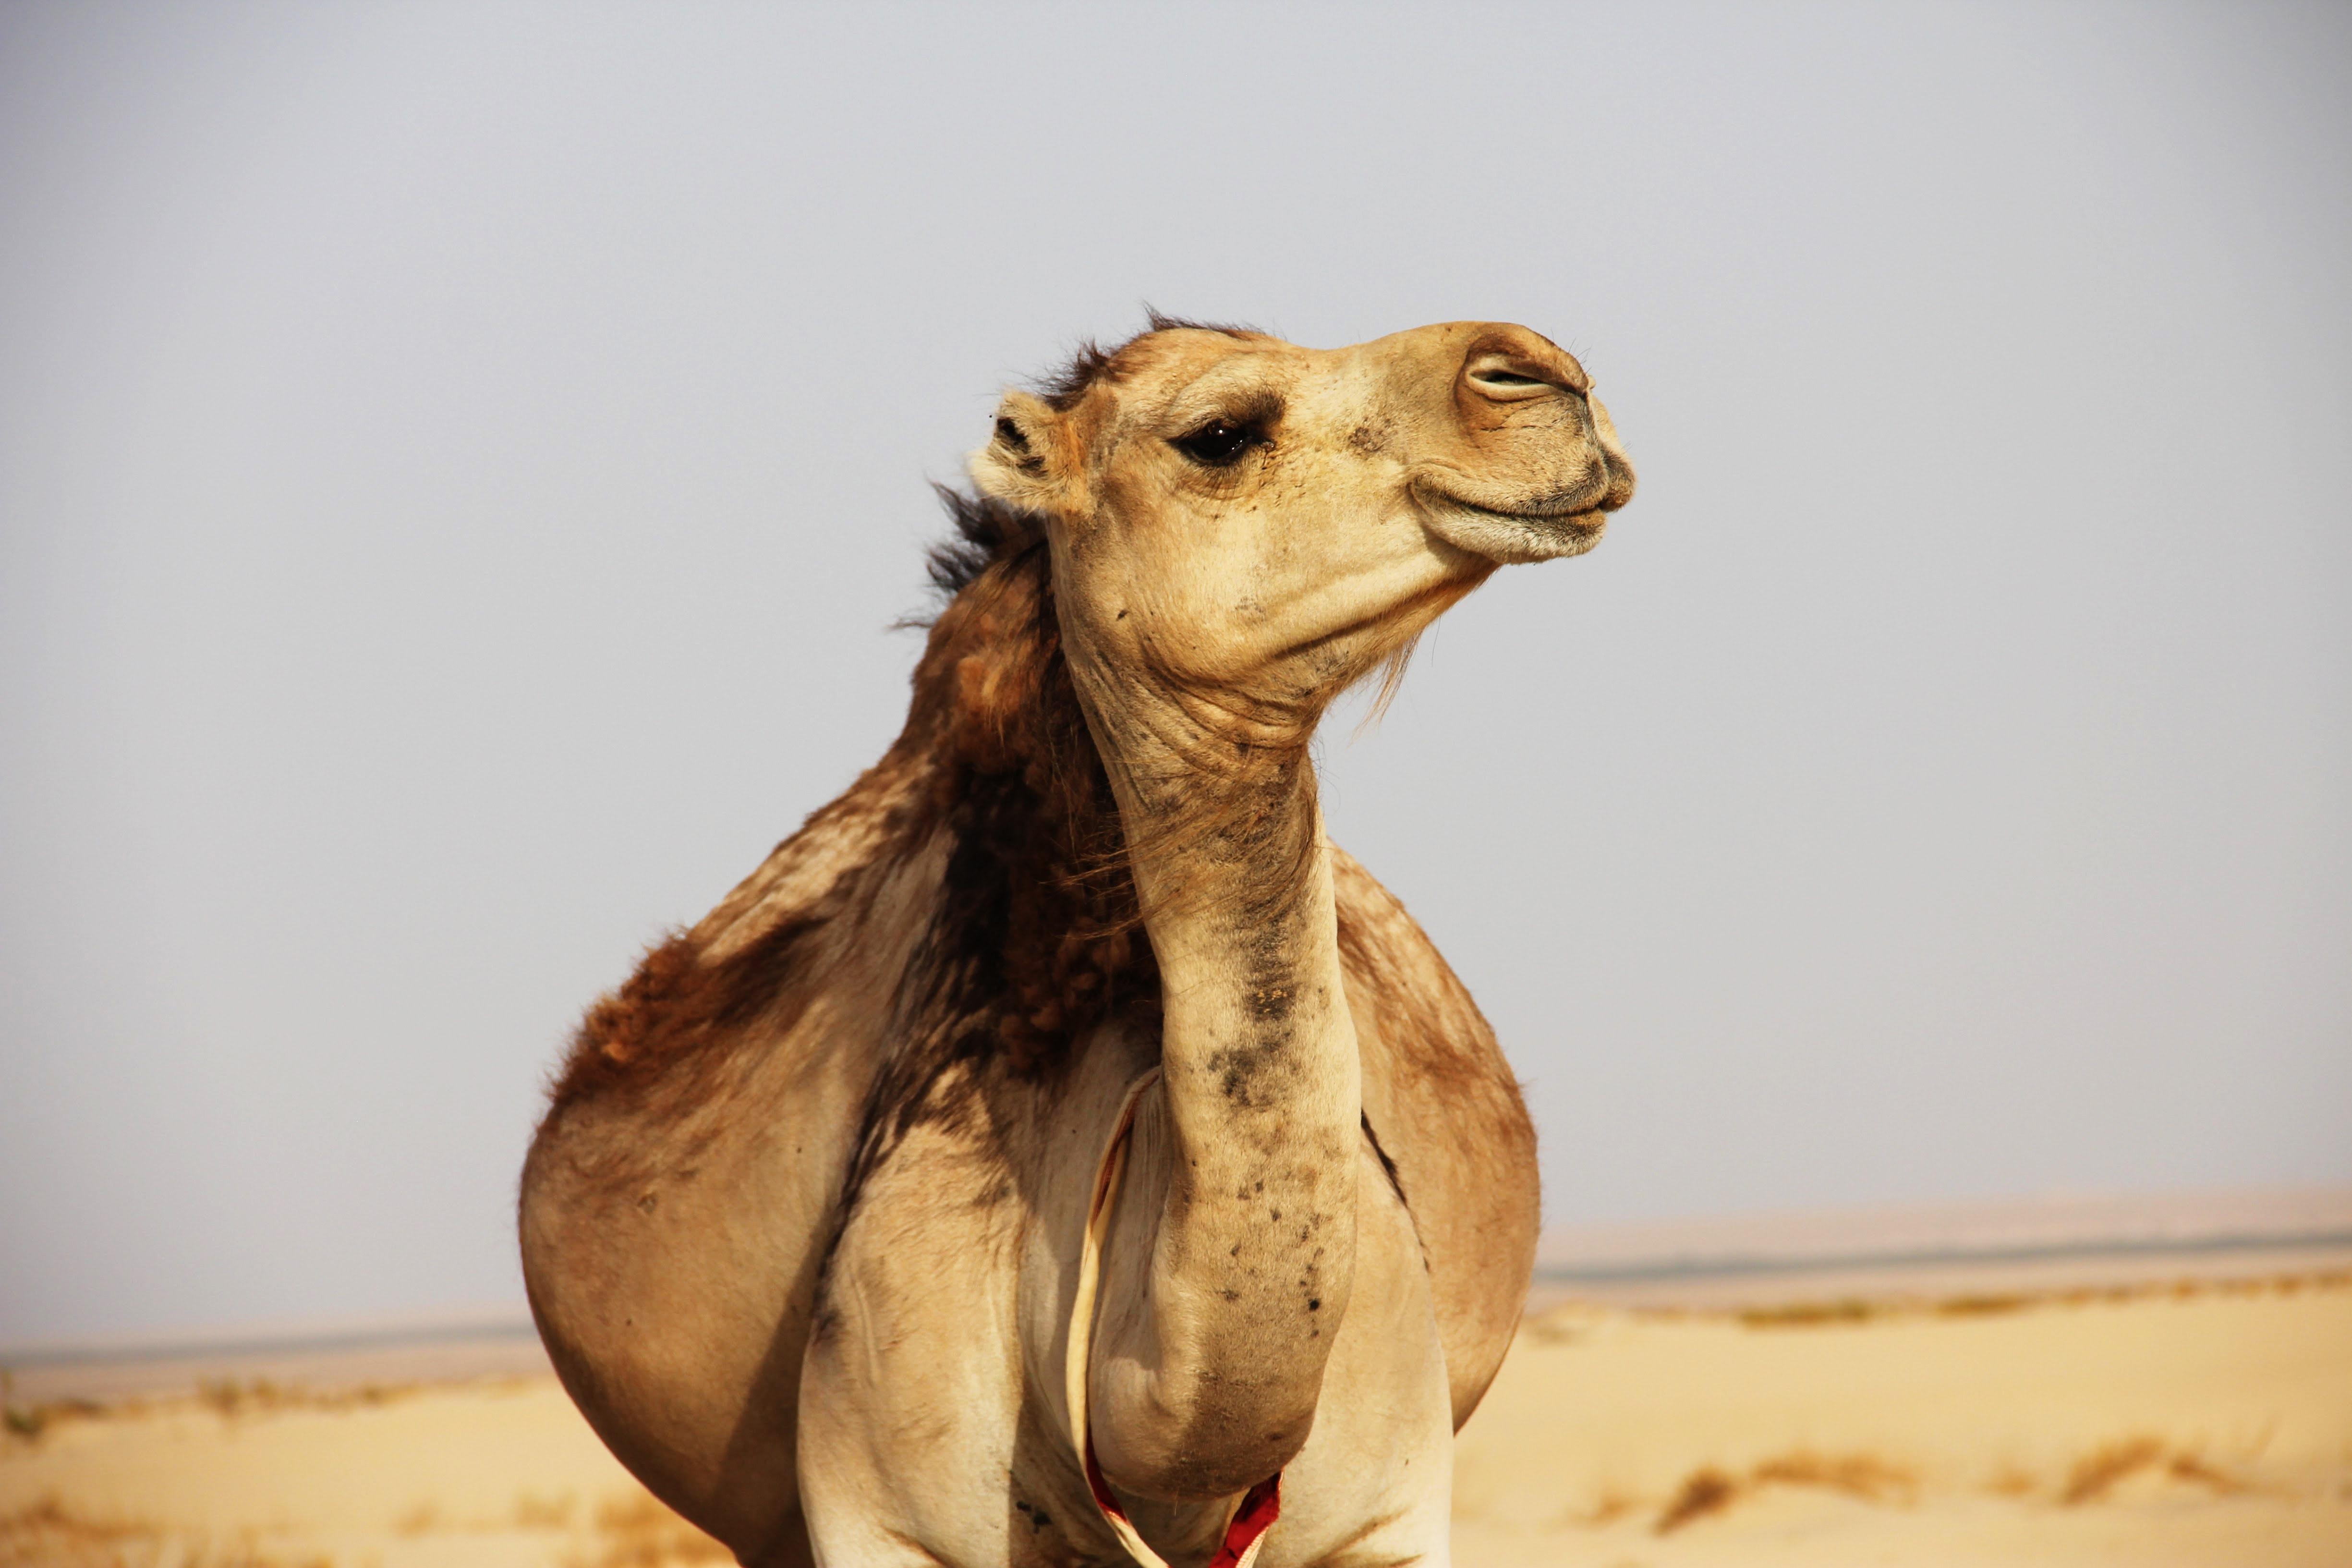 Camel ride in Pushkar, Wearing traditional costumes in Puhskar, things to do in Pushkar, Pushkar travel guide, camel safari in Pushkar